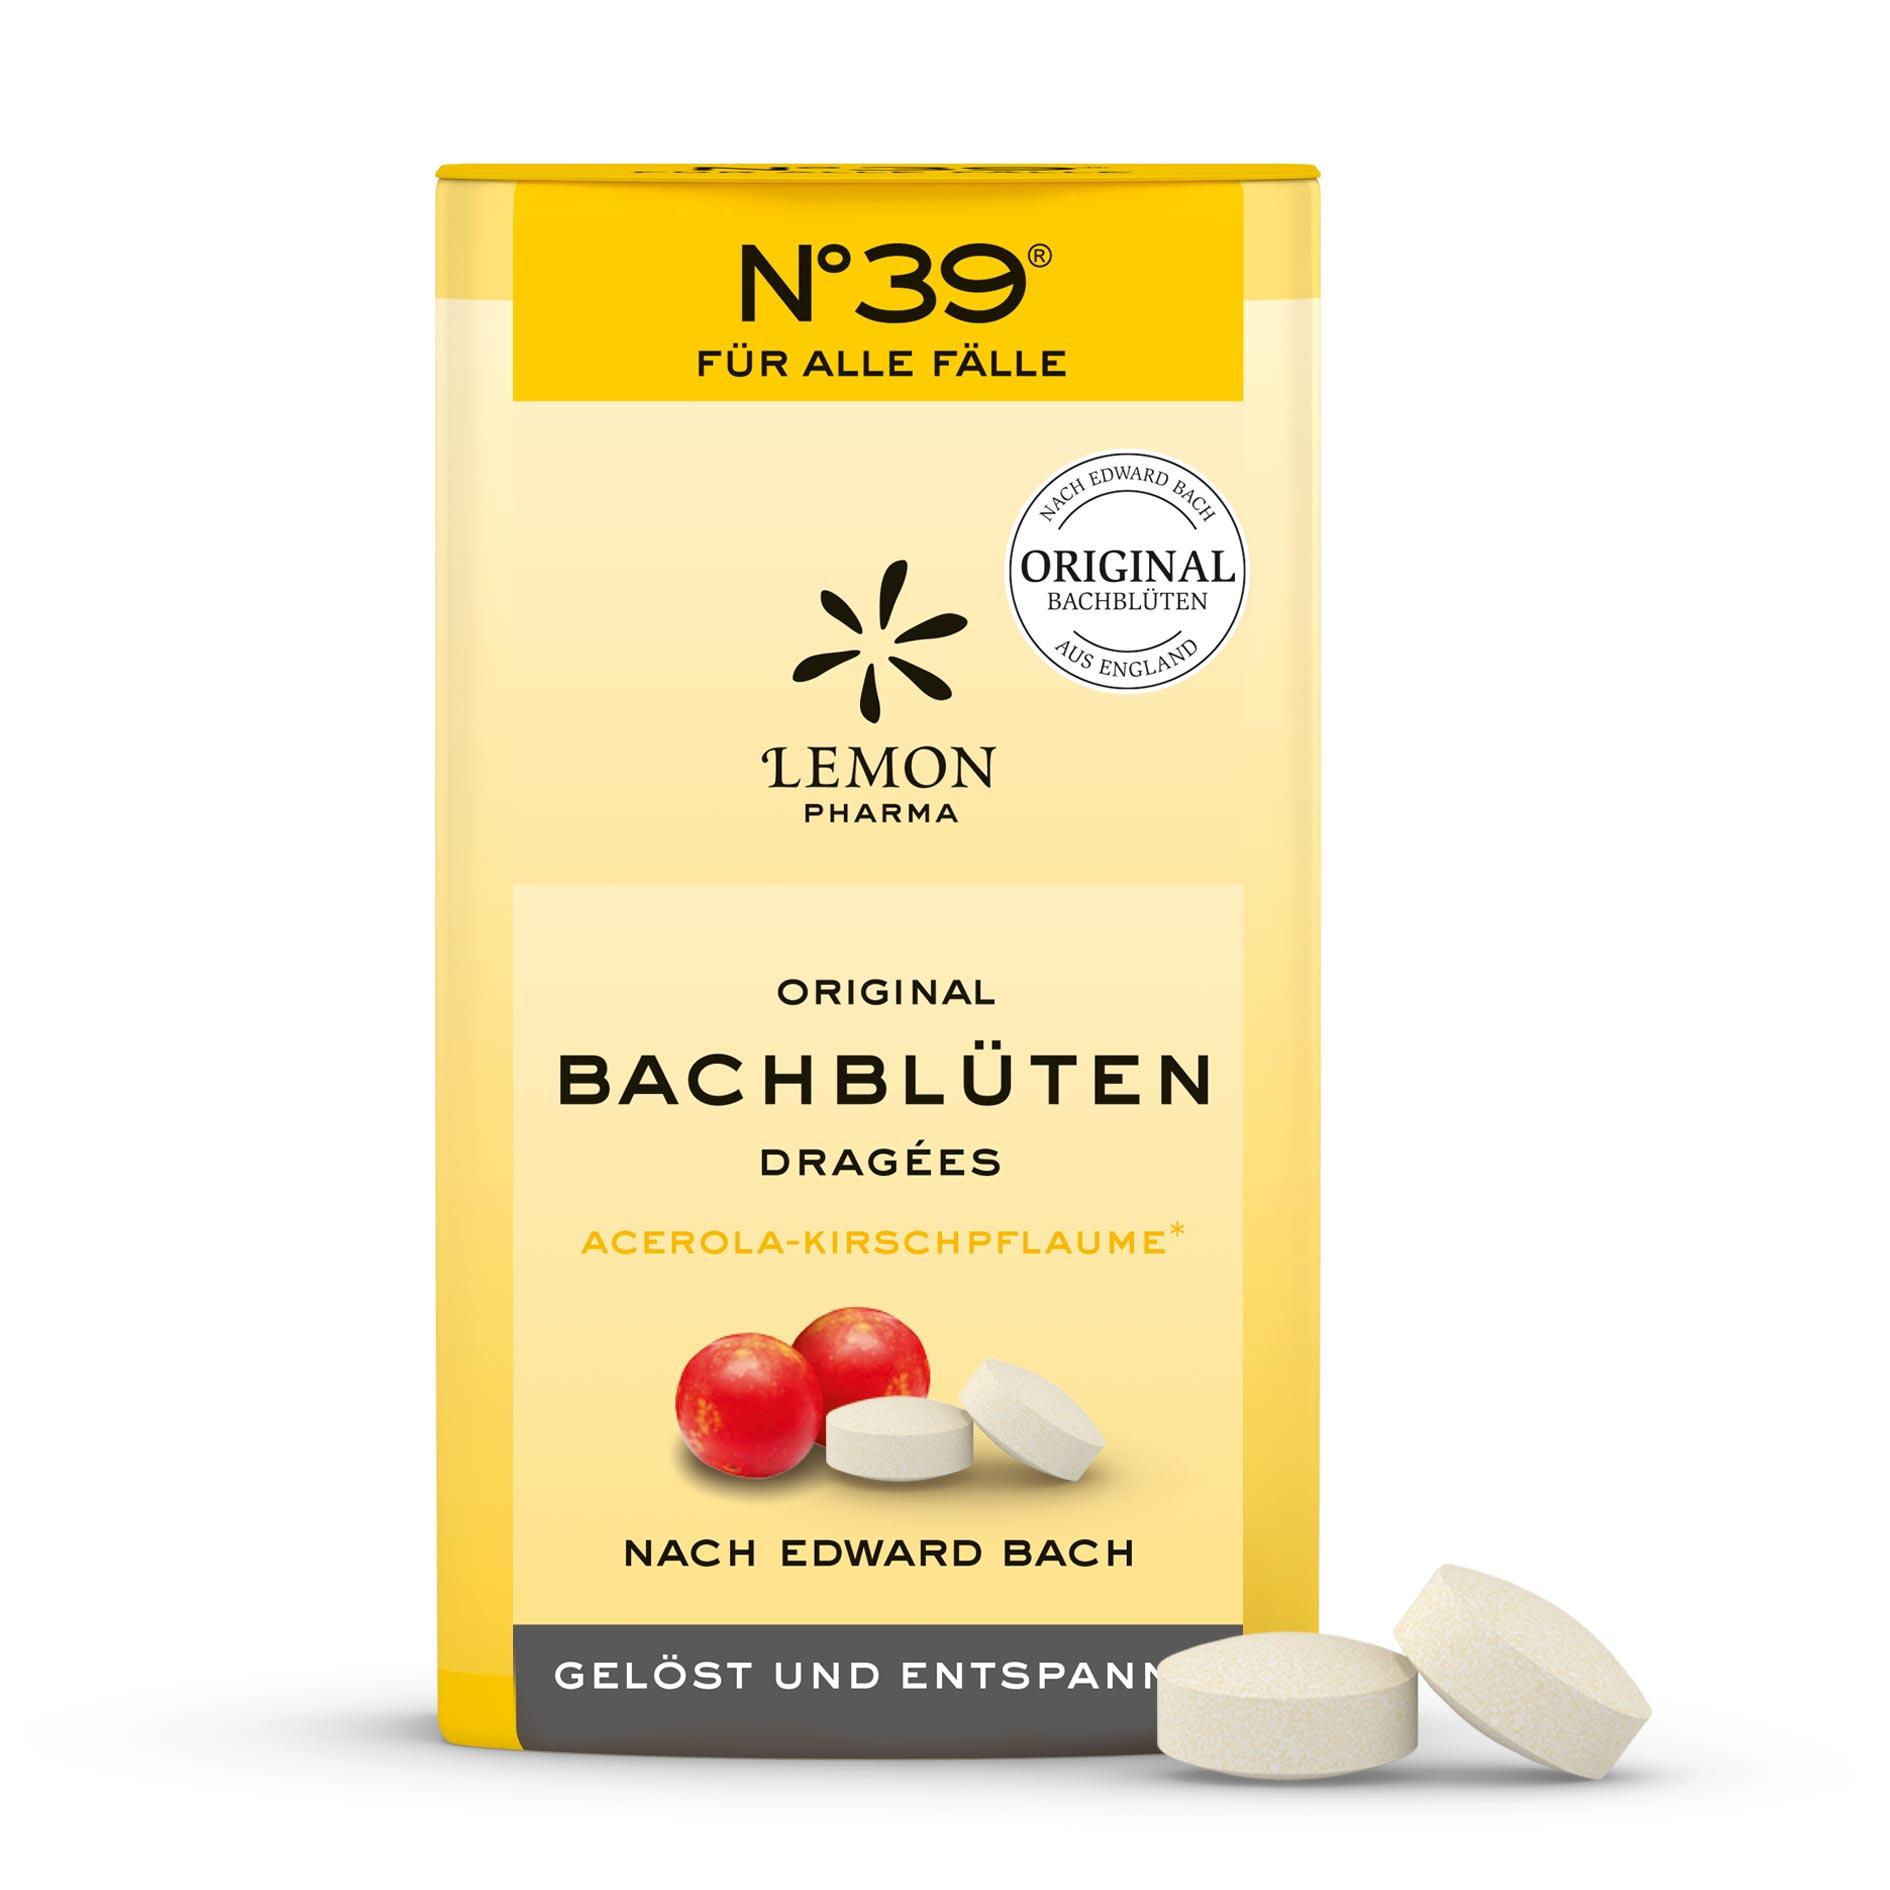 Dragees 39 Für alle Fälle Lemon Pharma Original Bachblüte Kirschpflaume